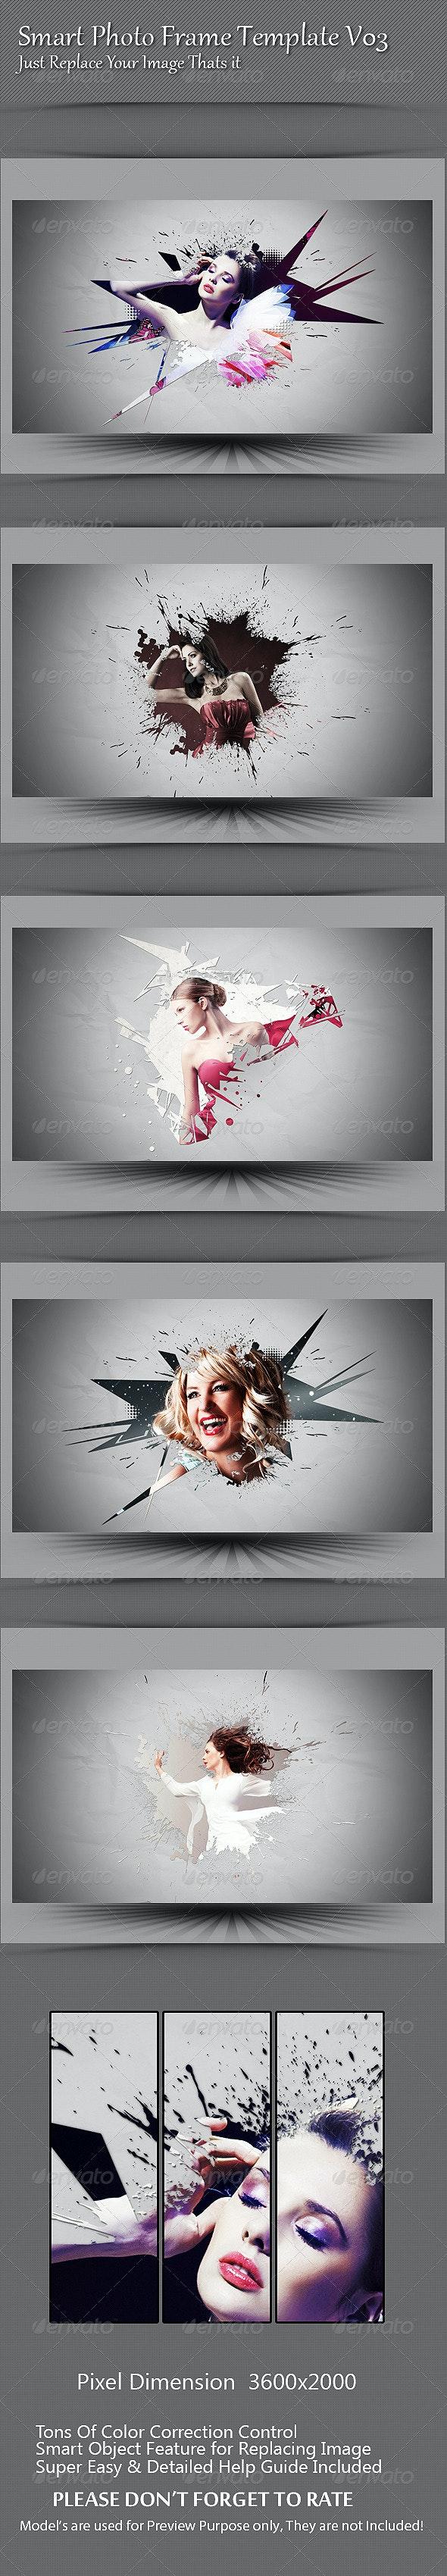 Smart Photo Frame Template V03 - Photo Templates Graphics